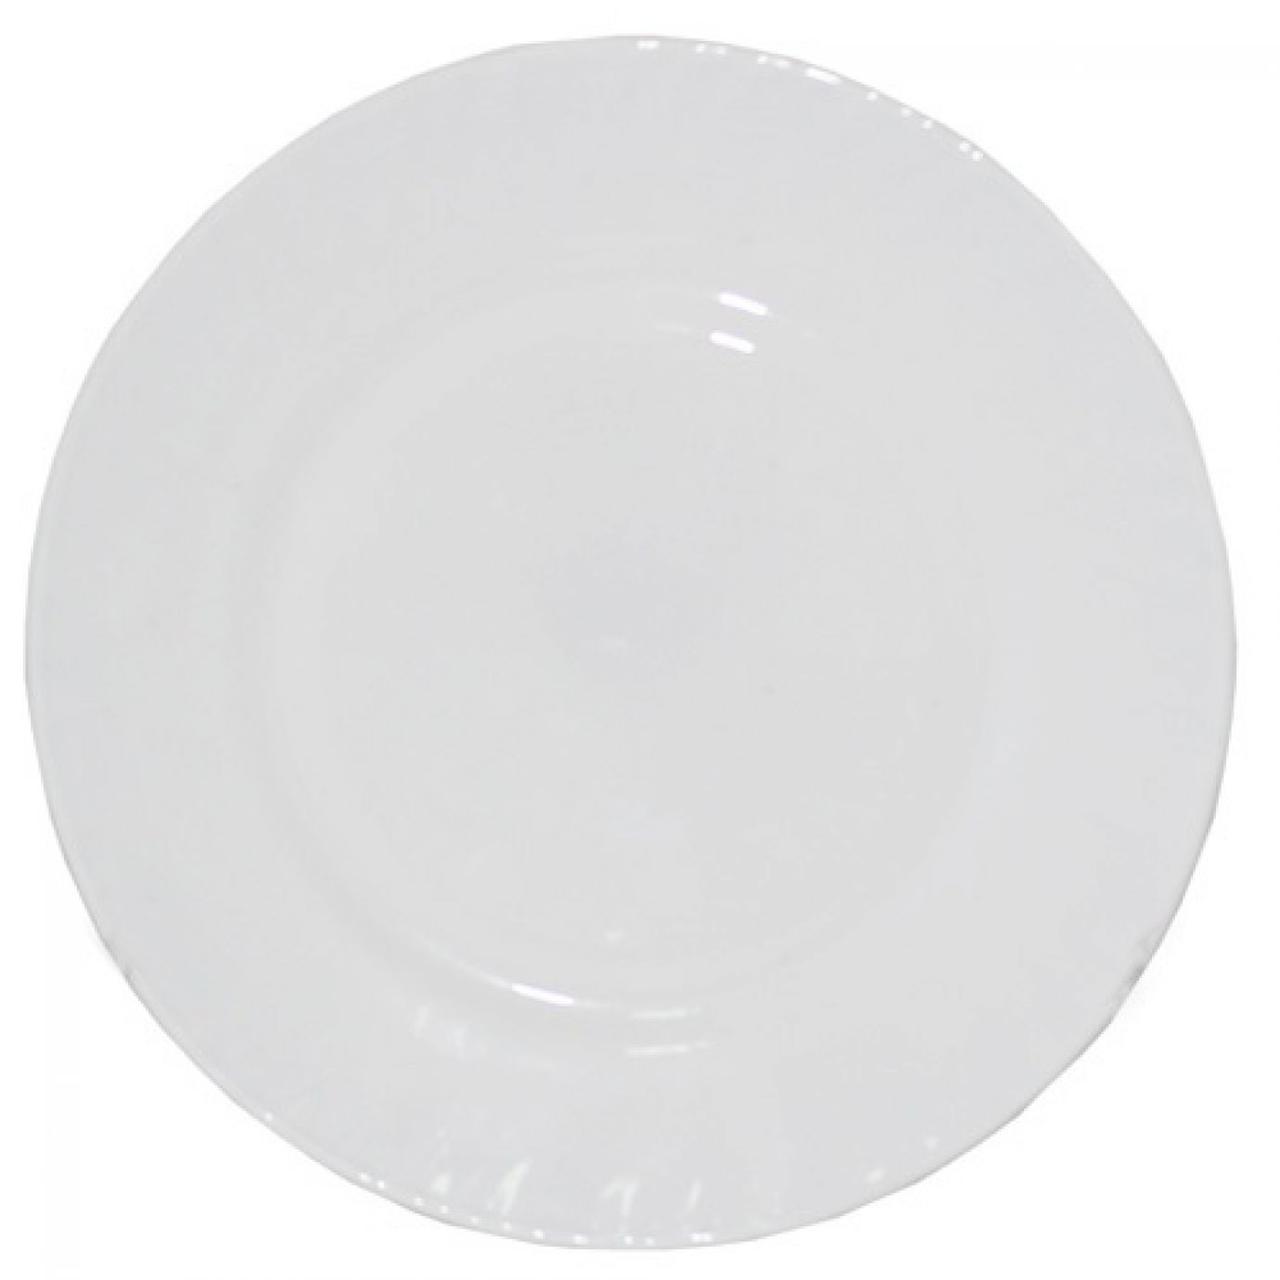 "Тарілка склокерам. ""Біла"" 9"" №30058-00(6)(48)/S&T"